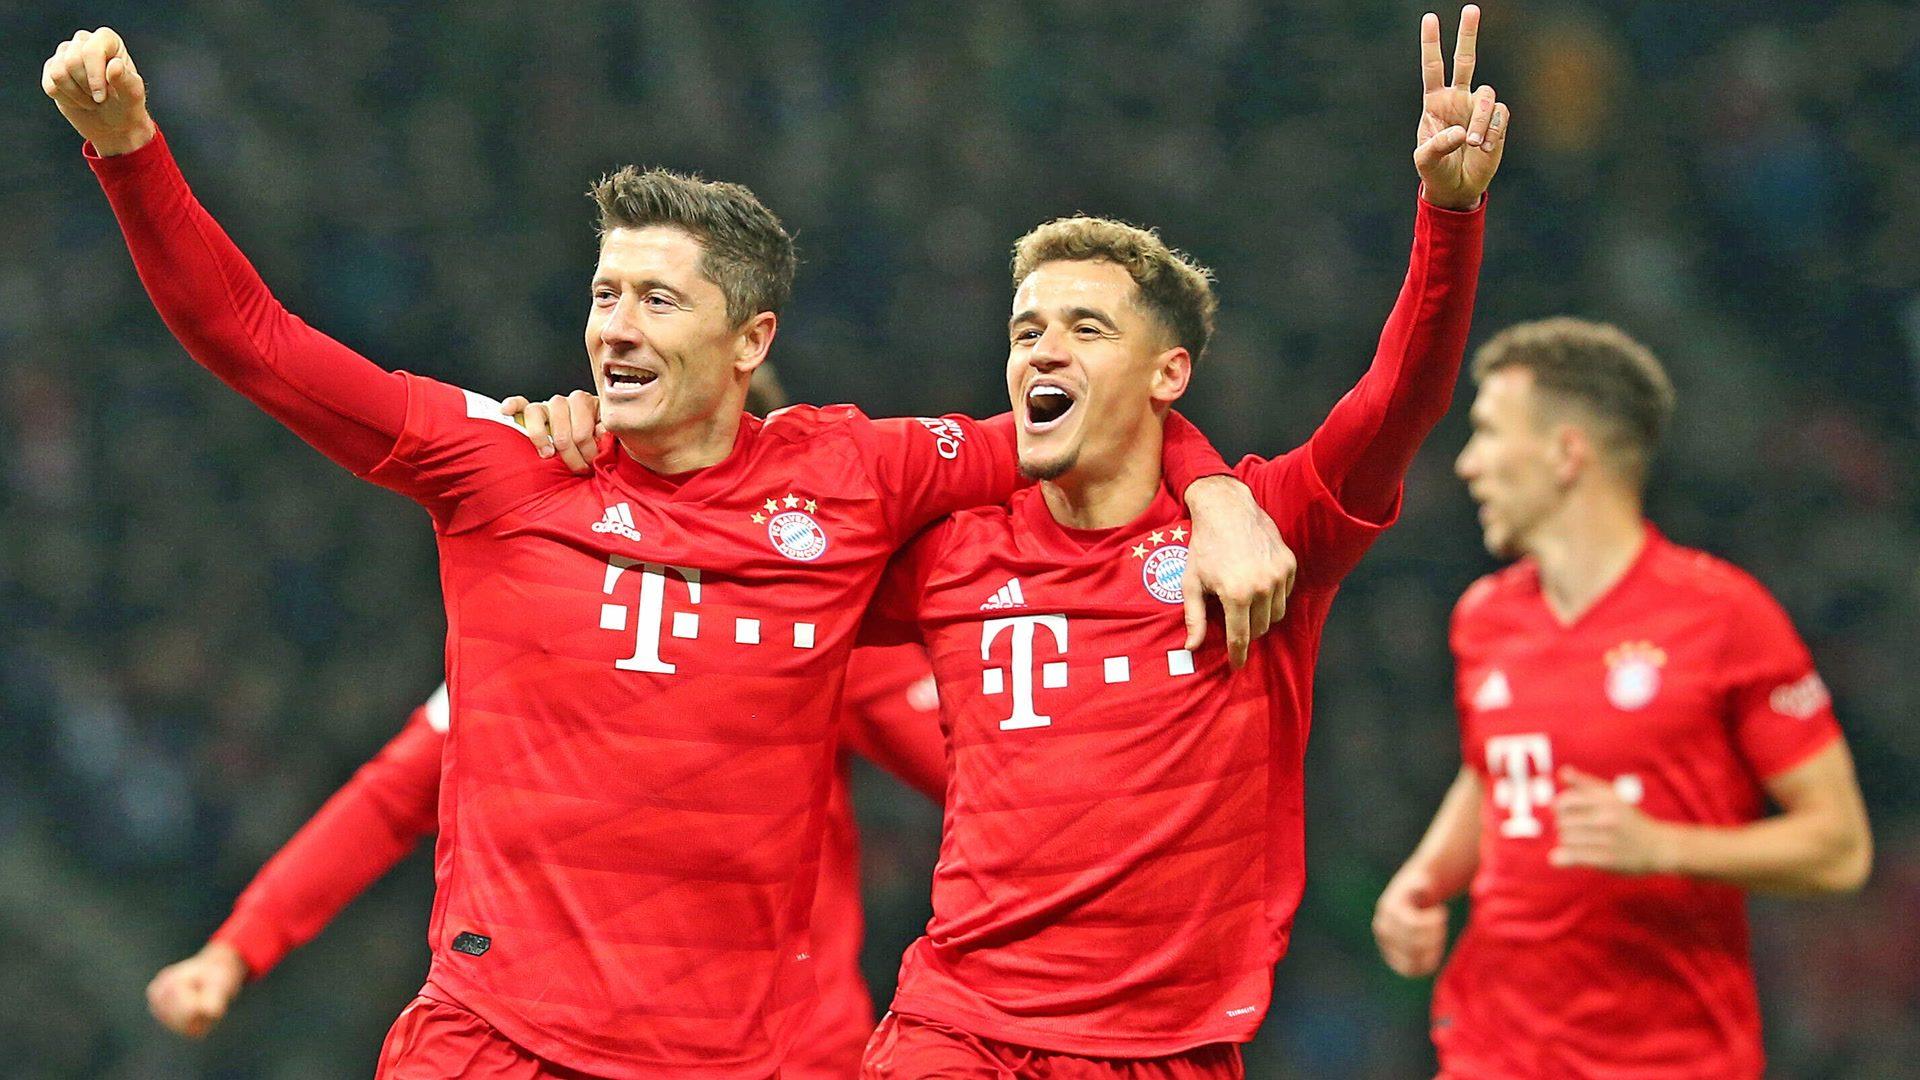 Bayern put four past Hertha in Berlin